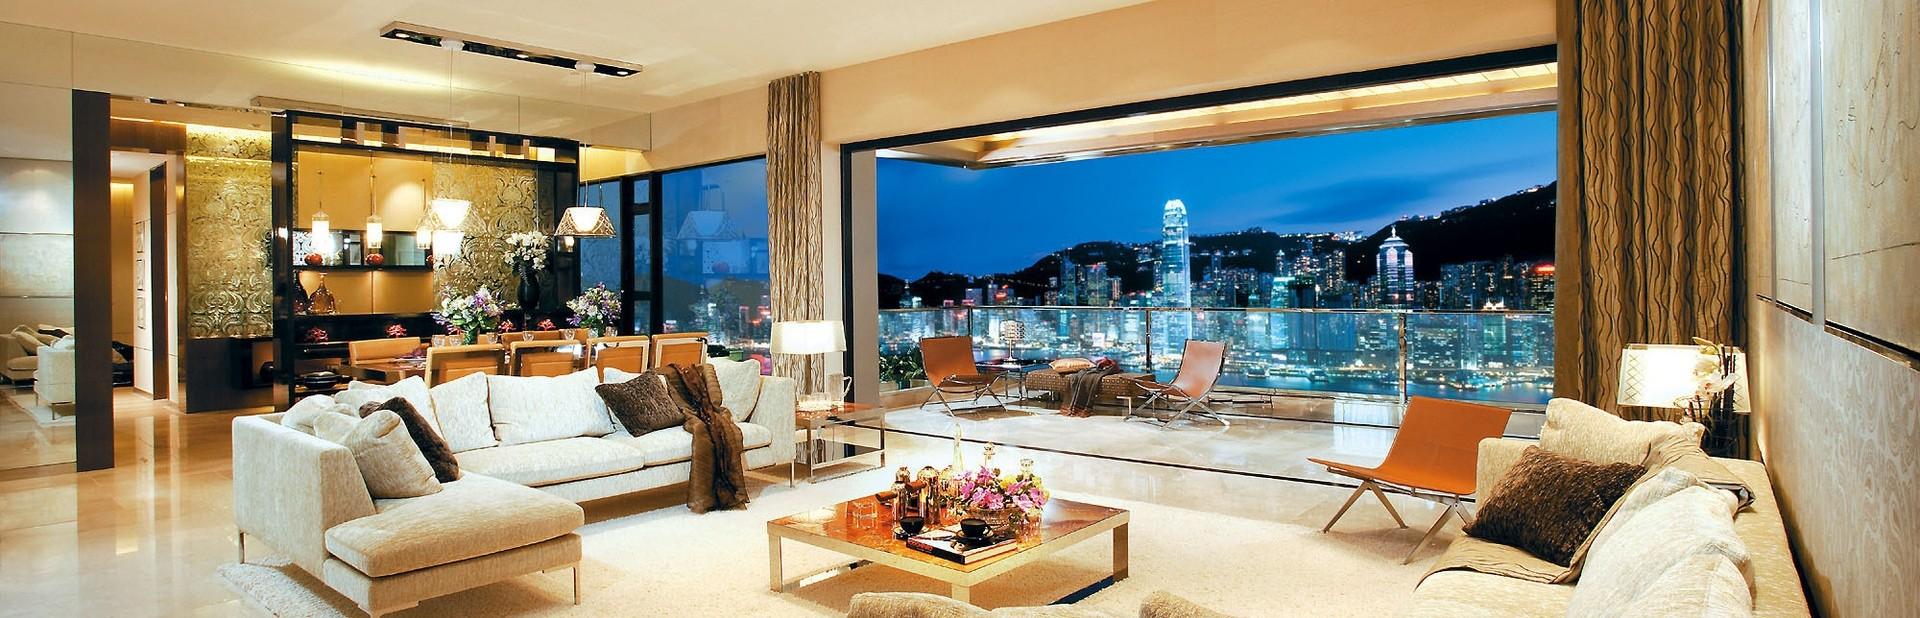 Make your new LA house feel like home